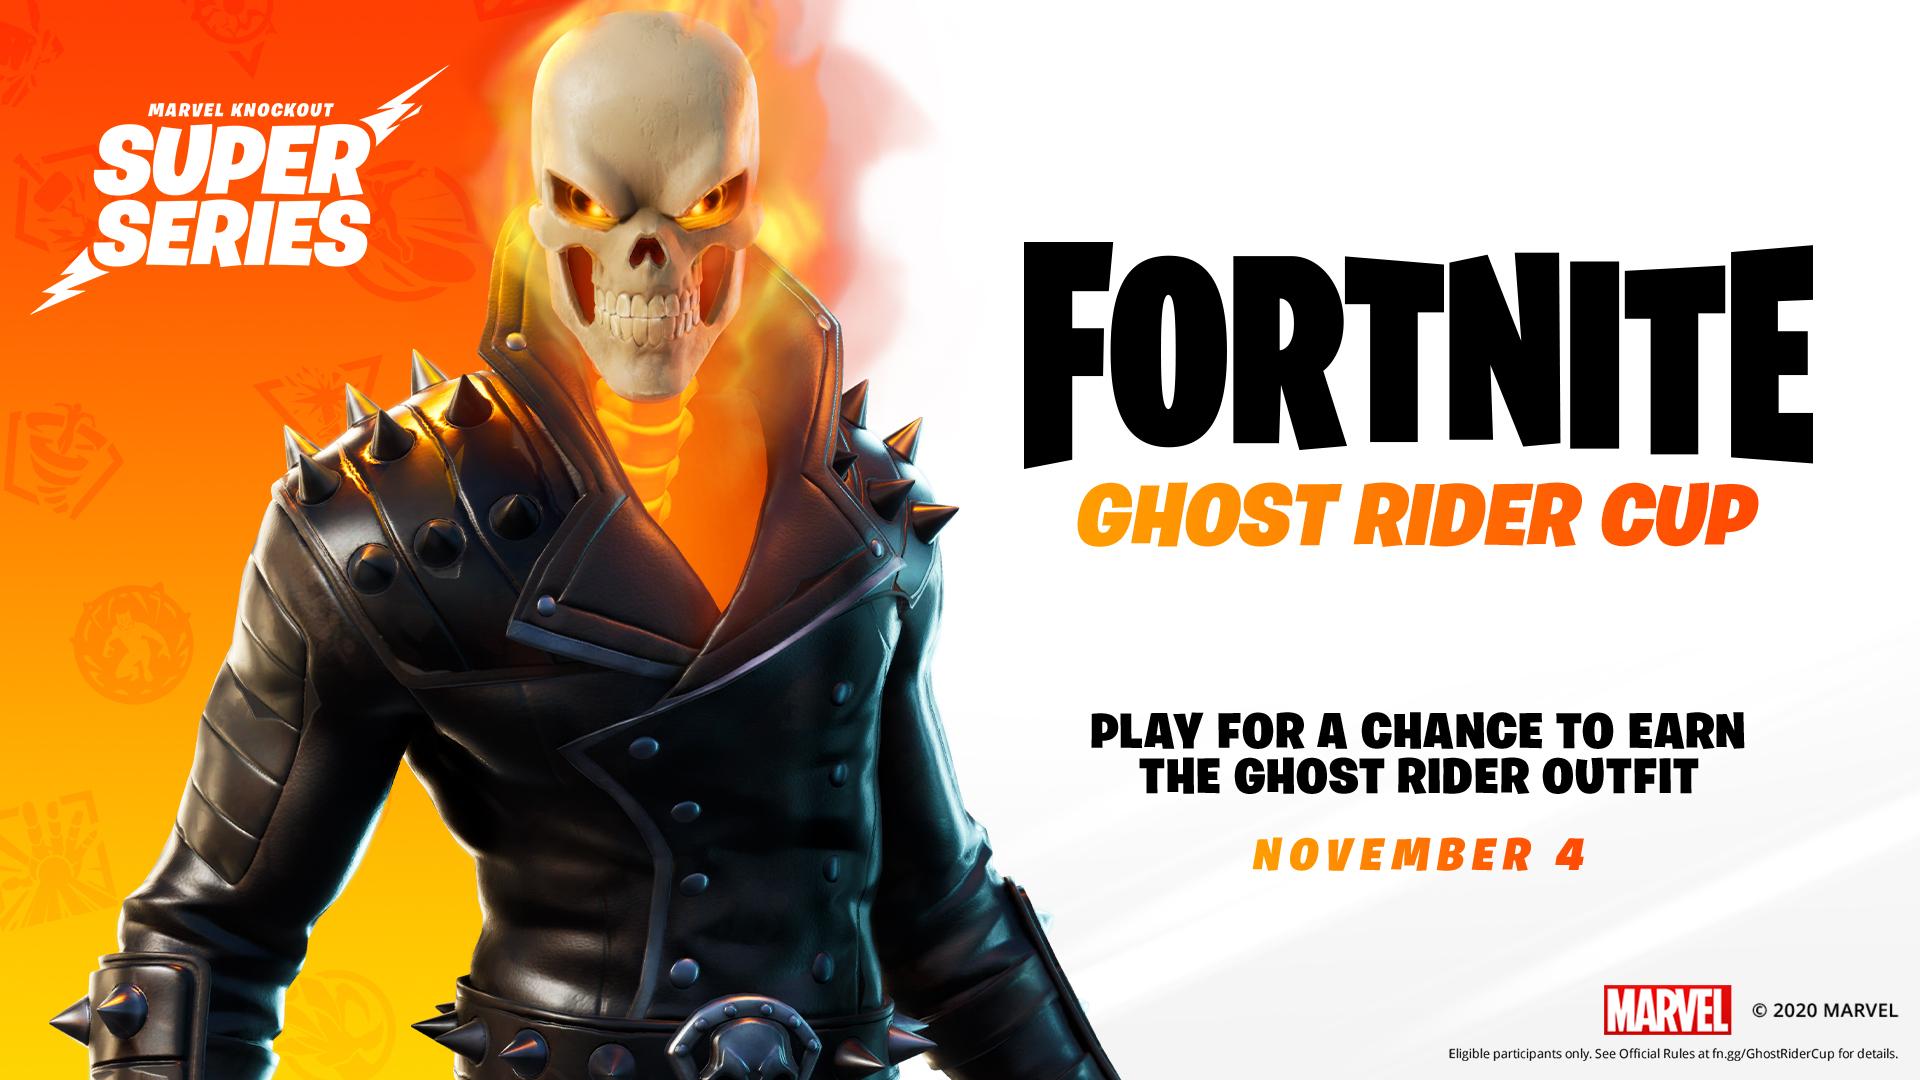 ghost rider cup skin fortnite season 4